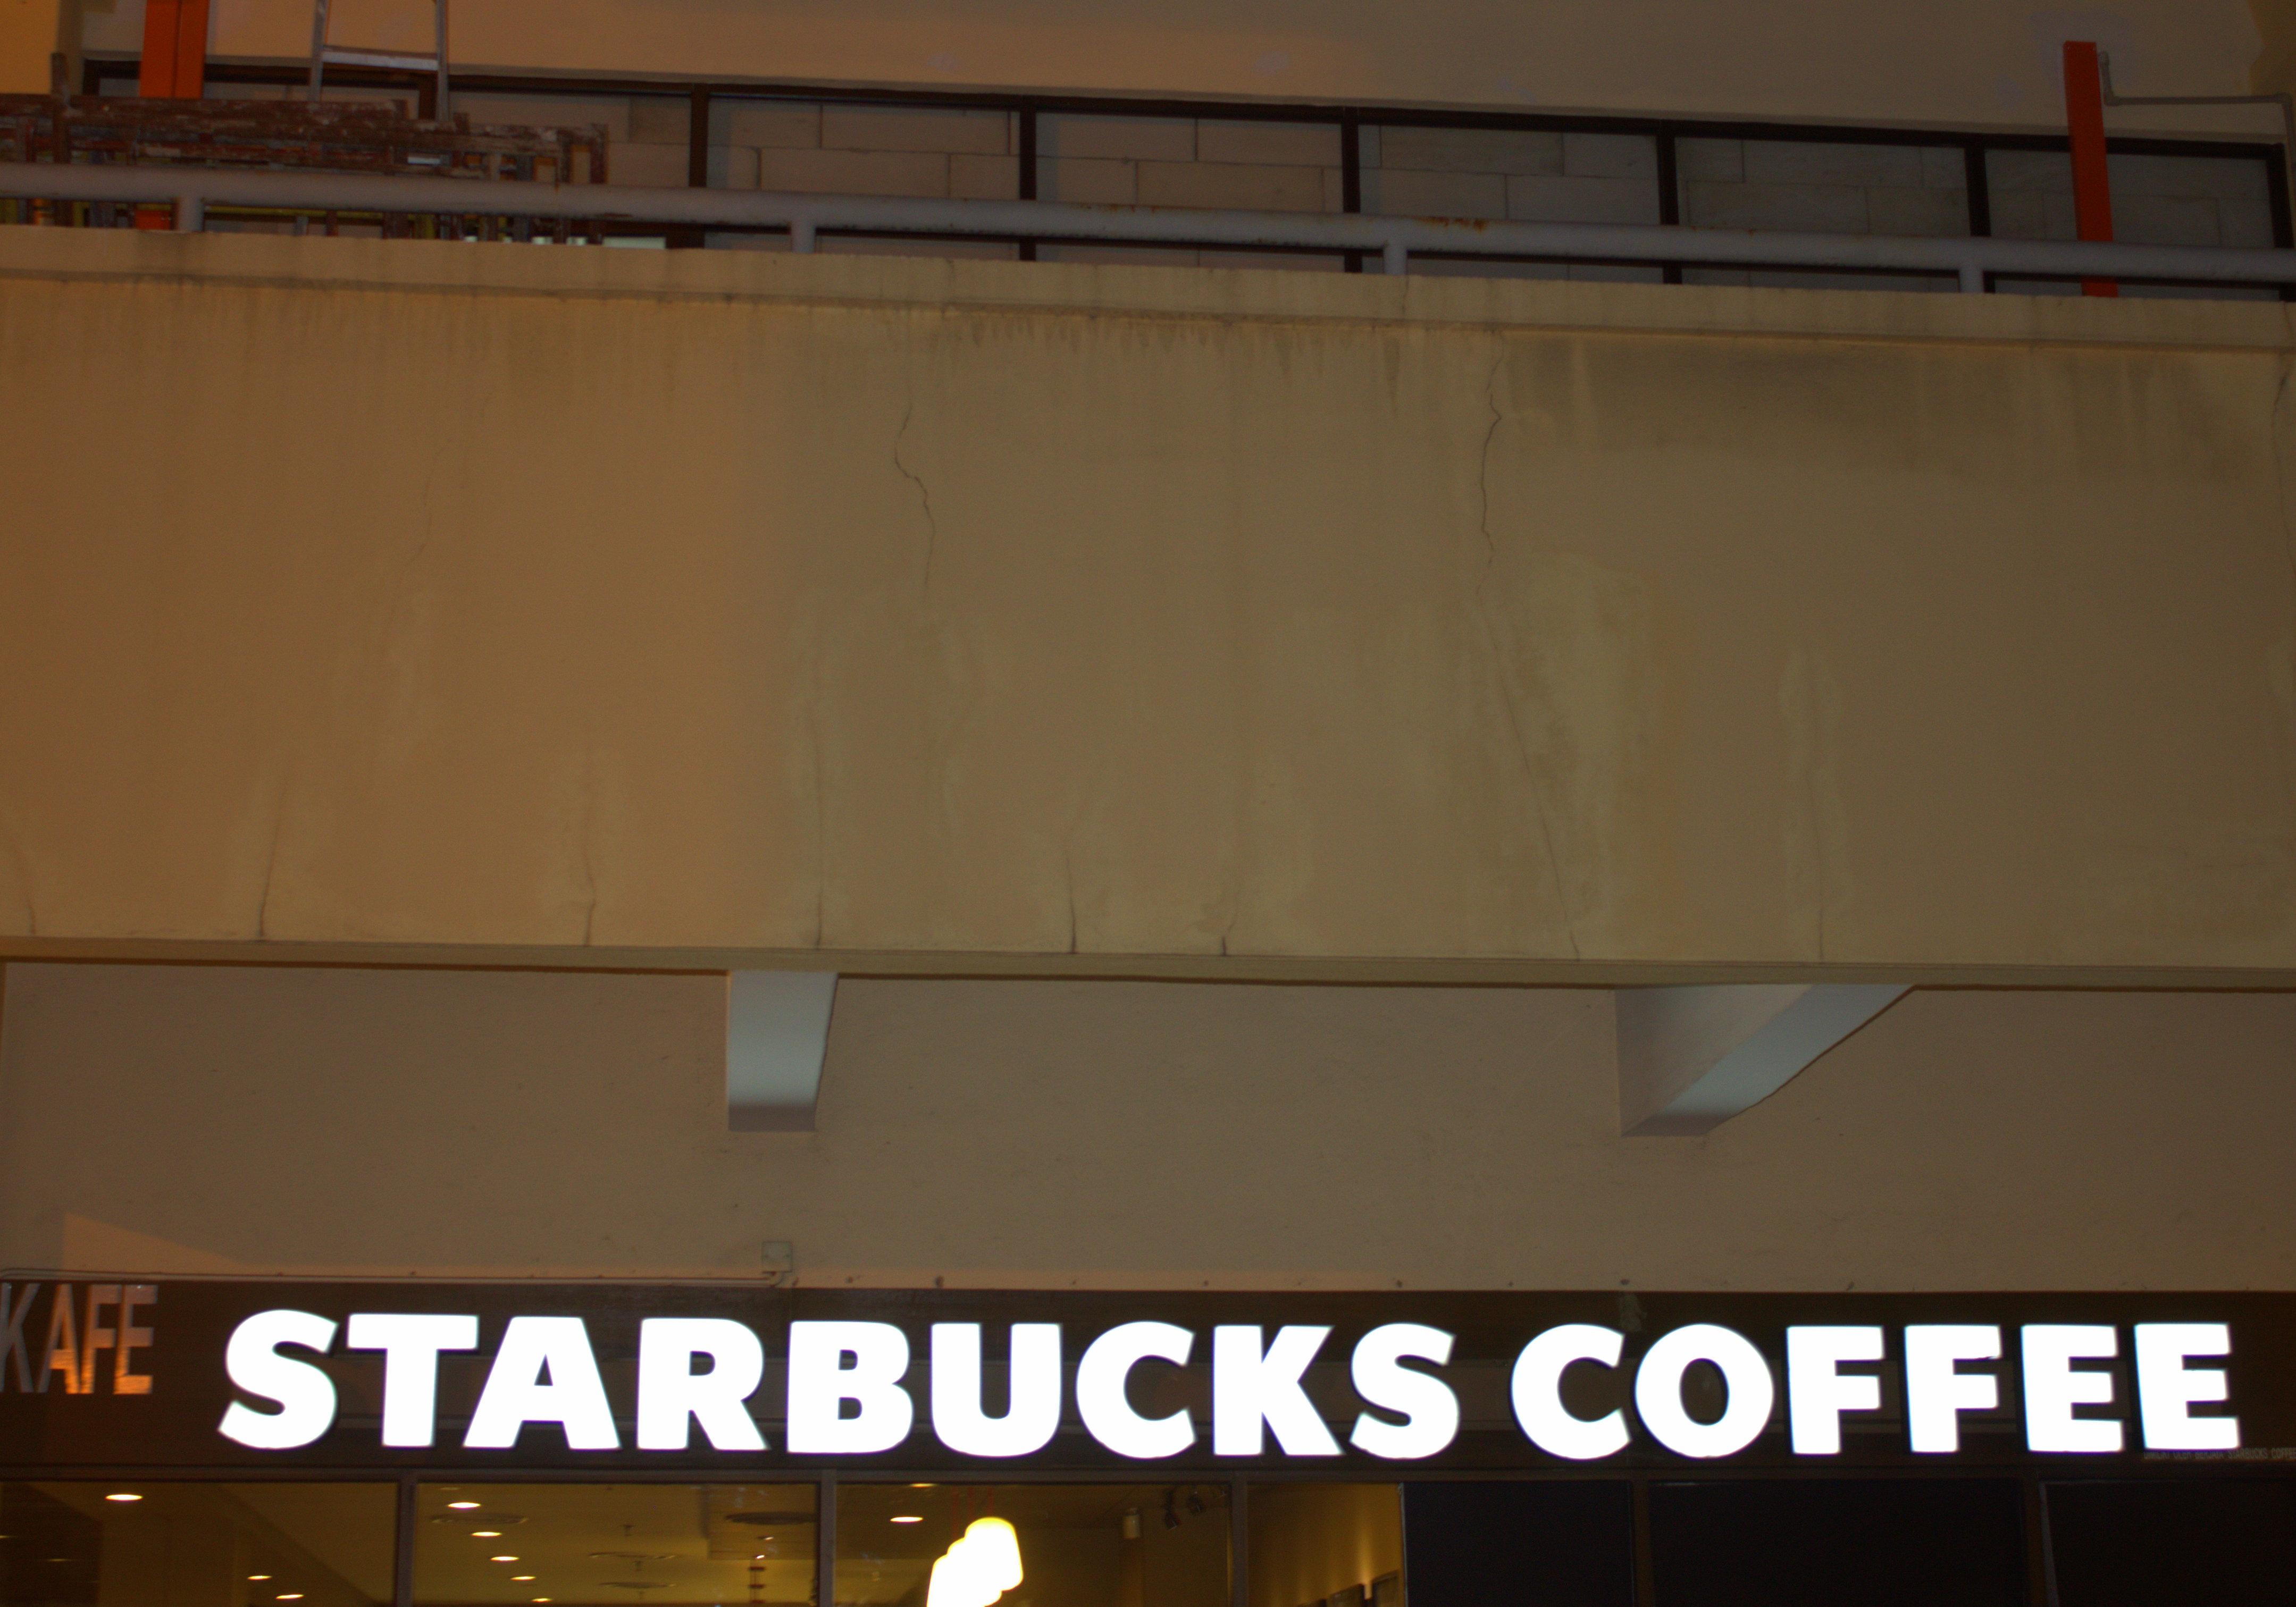 Malaysia - Starbucks